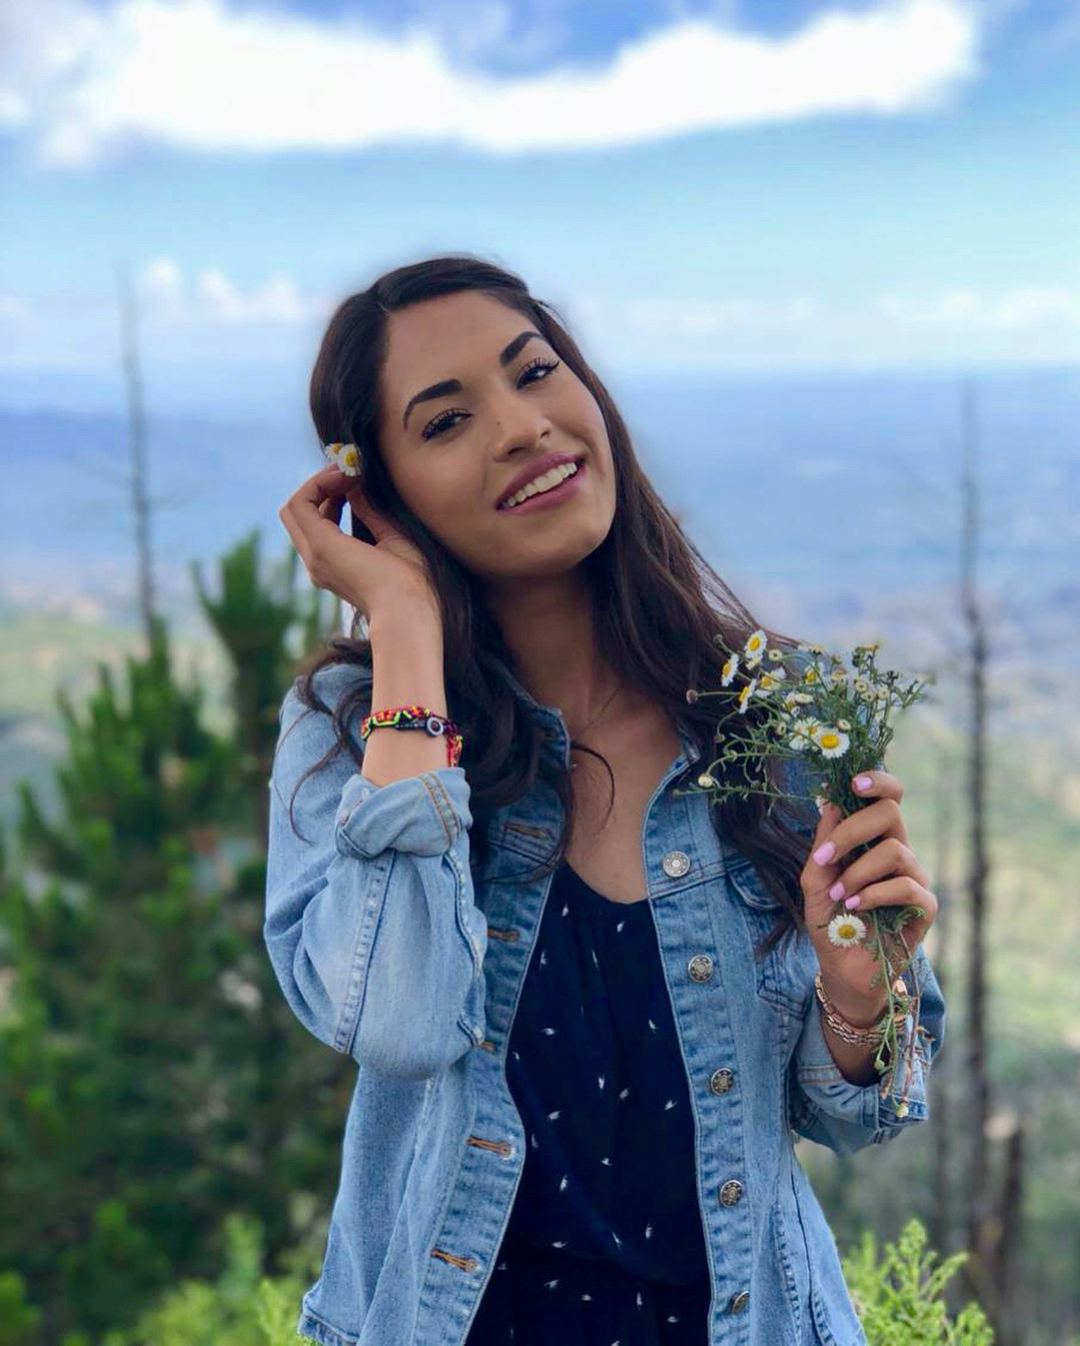 joely oralia garcia navarro, world miss tourism mexico 2018/miss globe mexico 2017. - Página 2 36930210